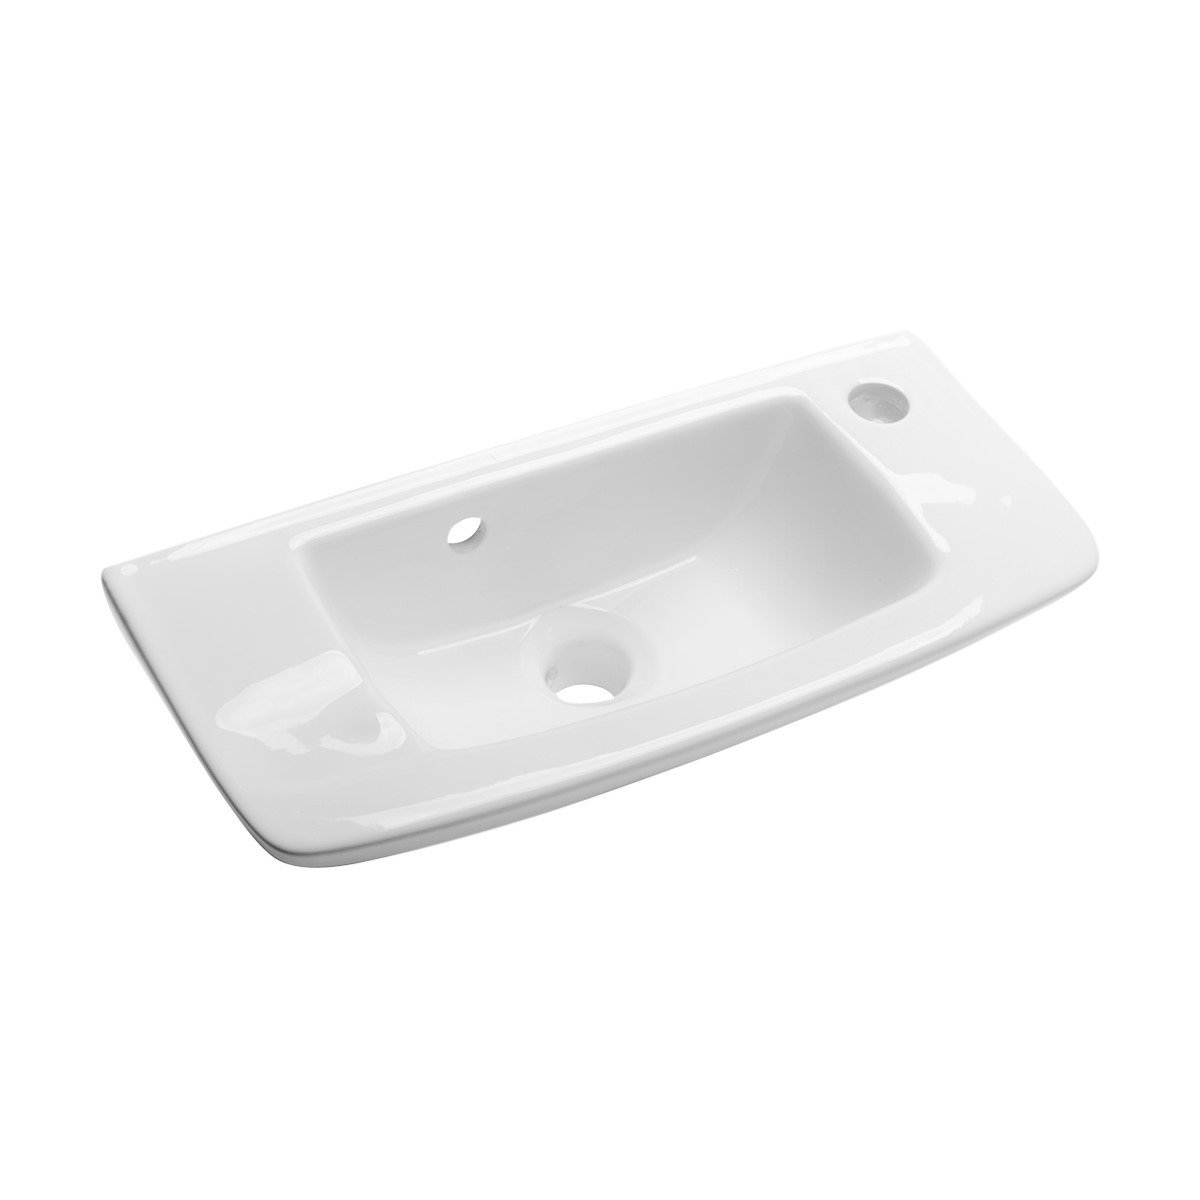 Small Bathroom Sinks: Amazon.com